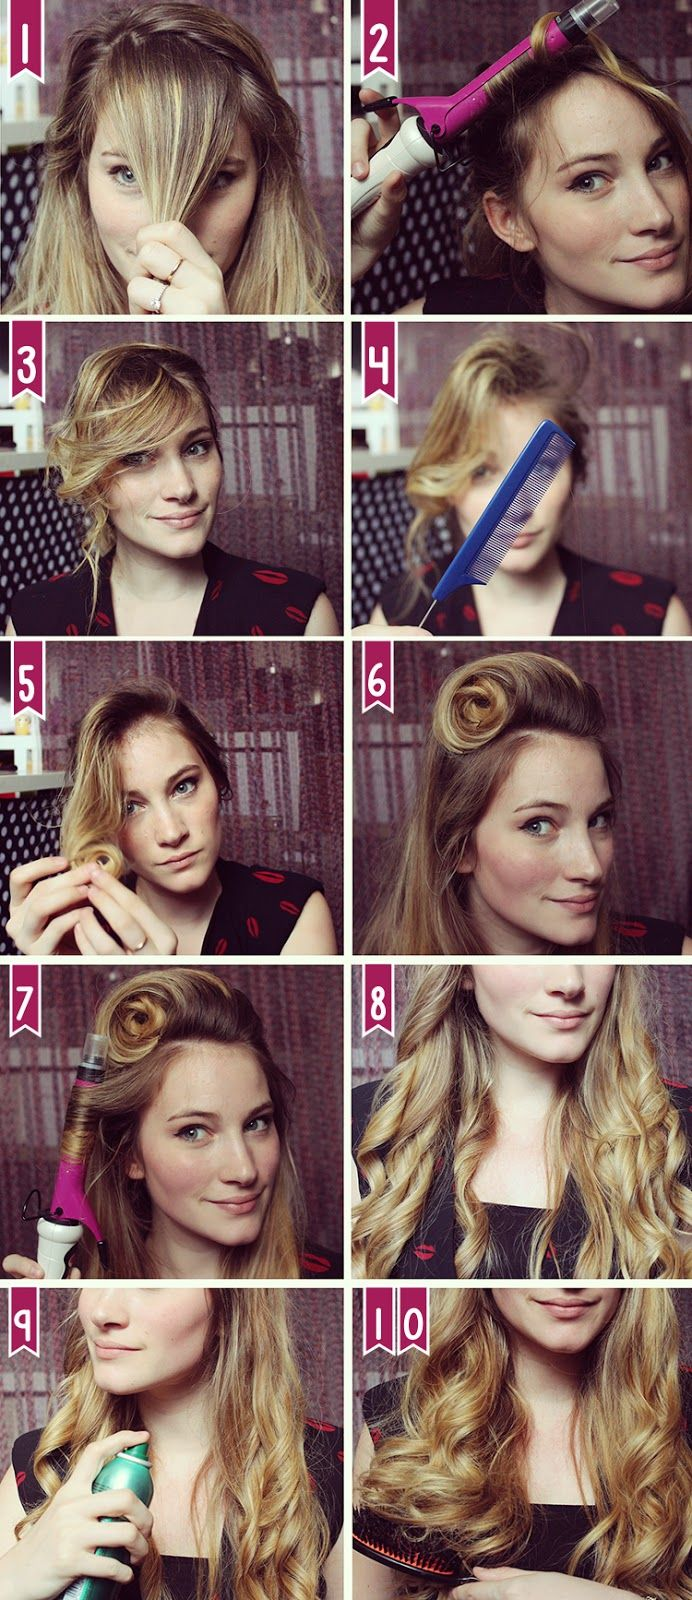 ... on Pinup ?  ♥ Tiboudnezs Make up & beauty tips ♥  Pinterest